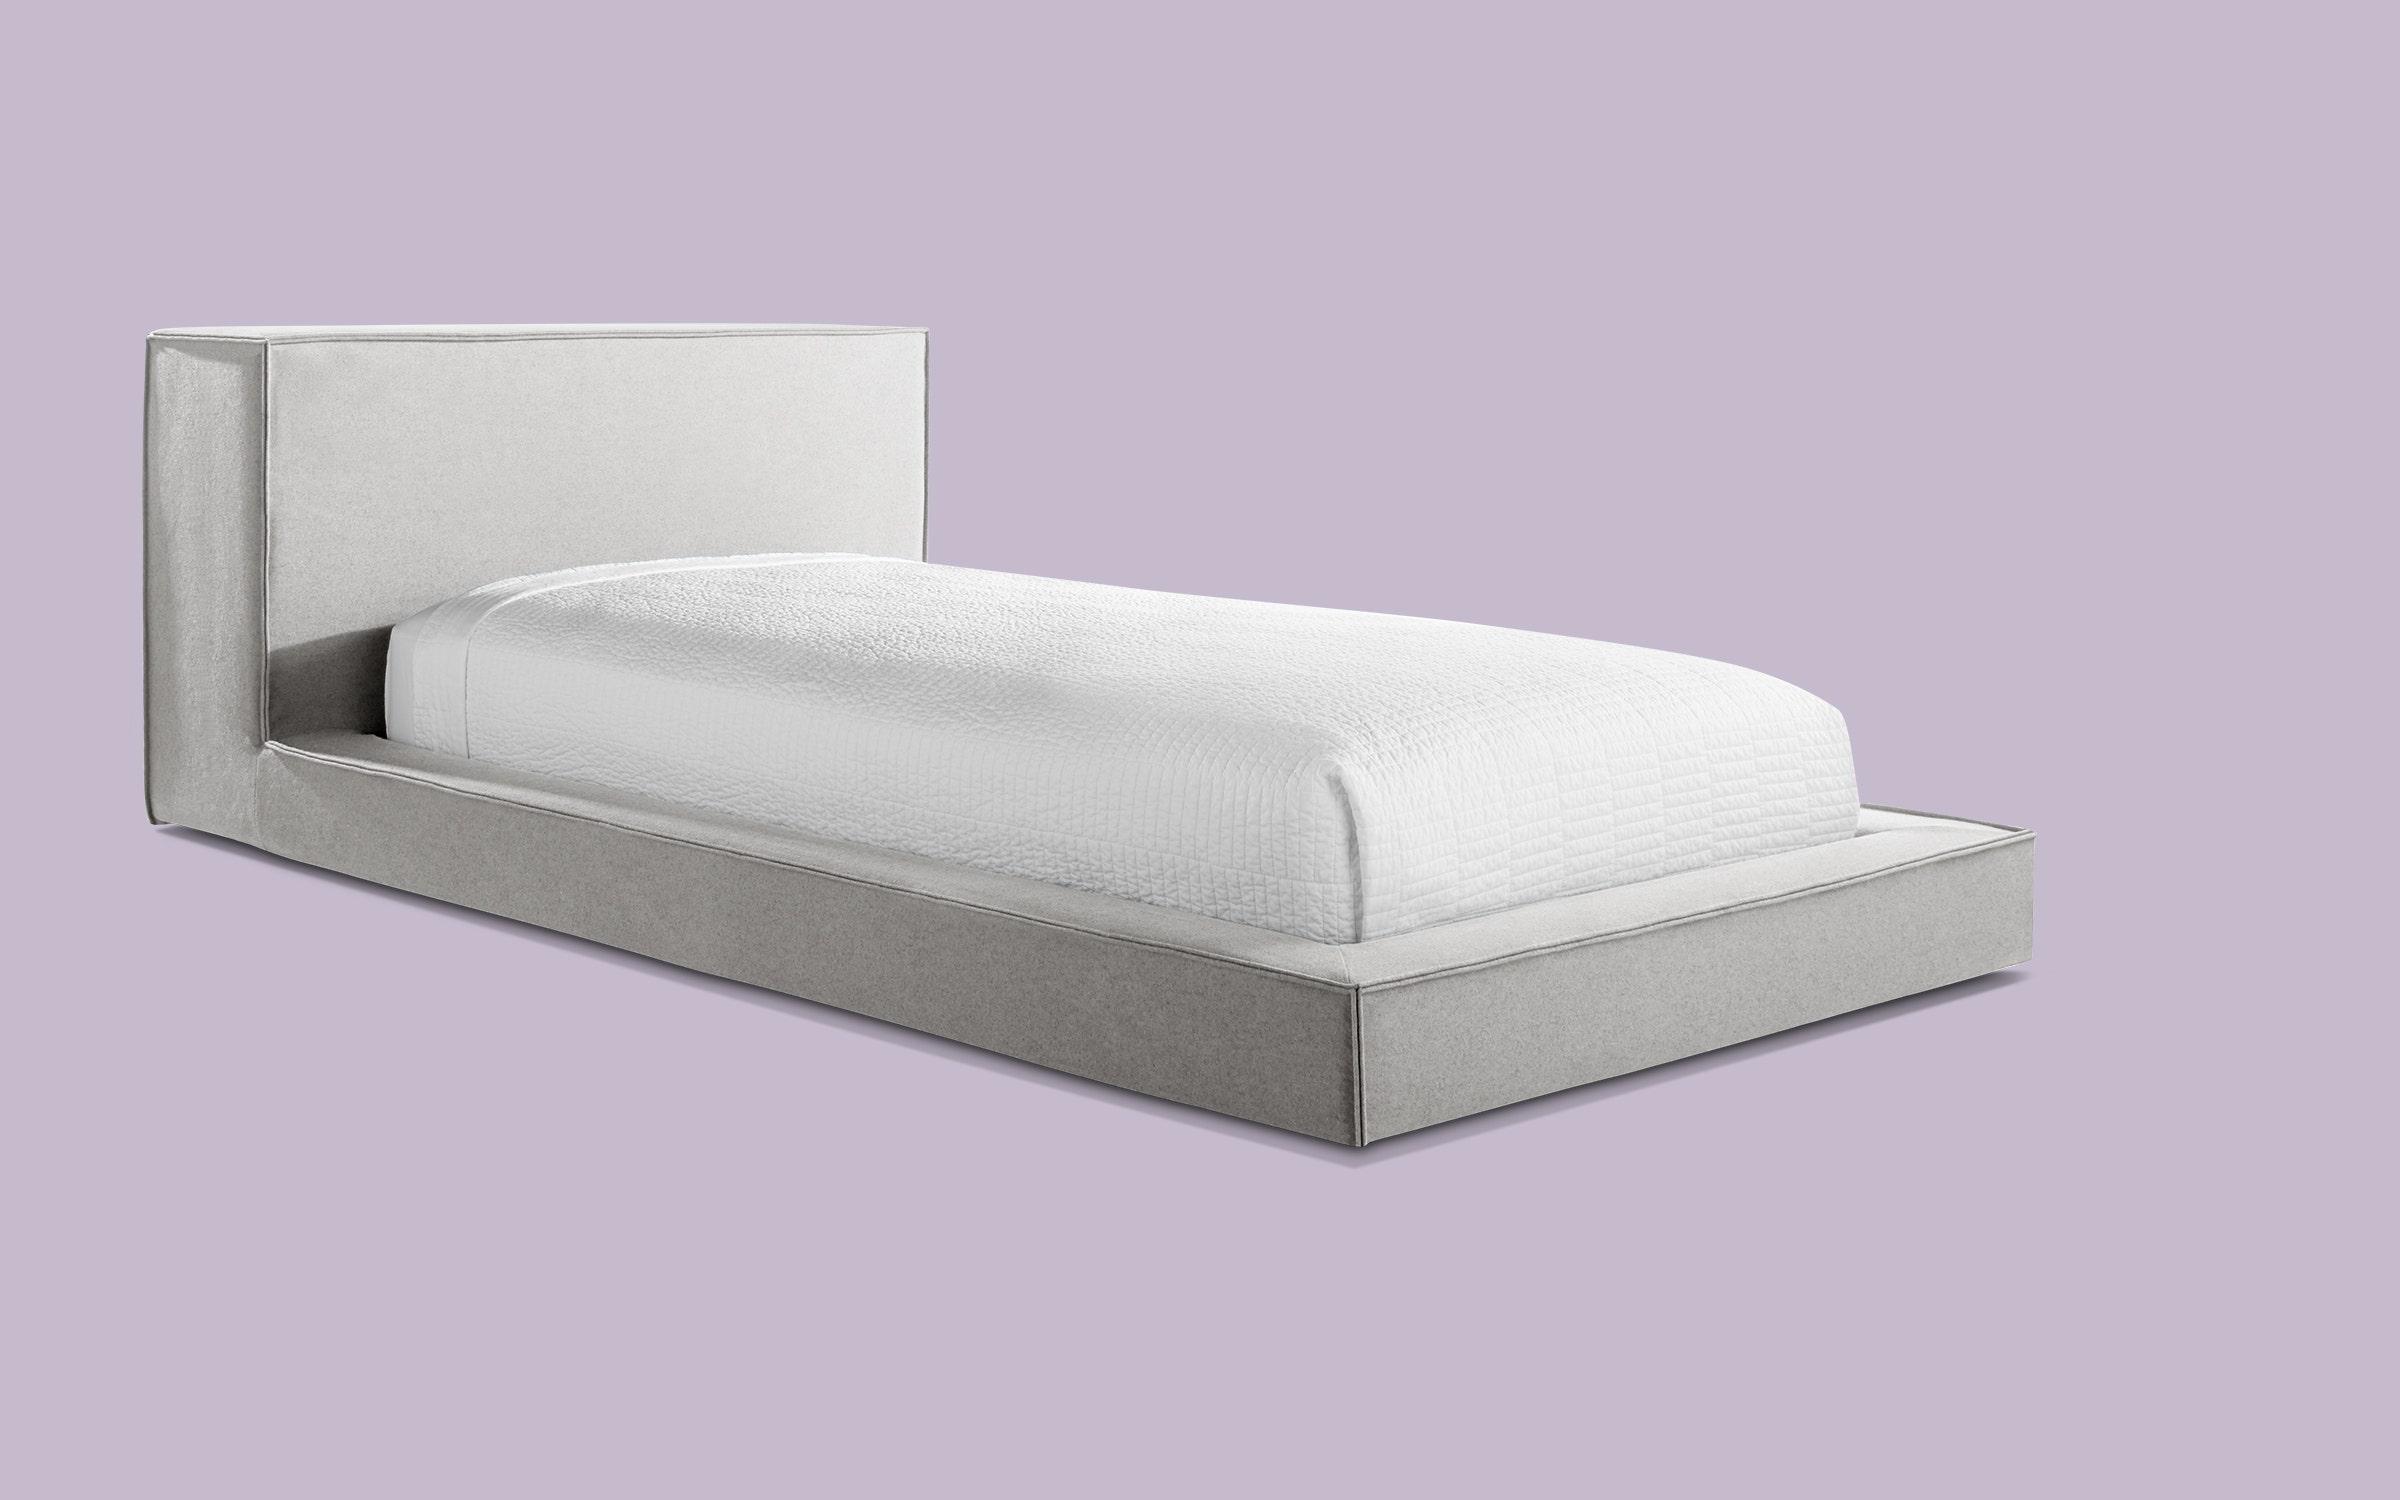 Dodu Twin Platform Bed - Modern Twin Platform Bed Frame | Blu Dot